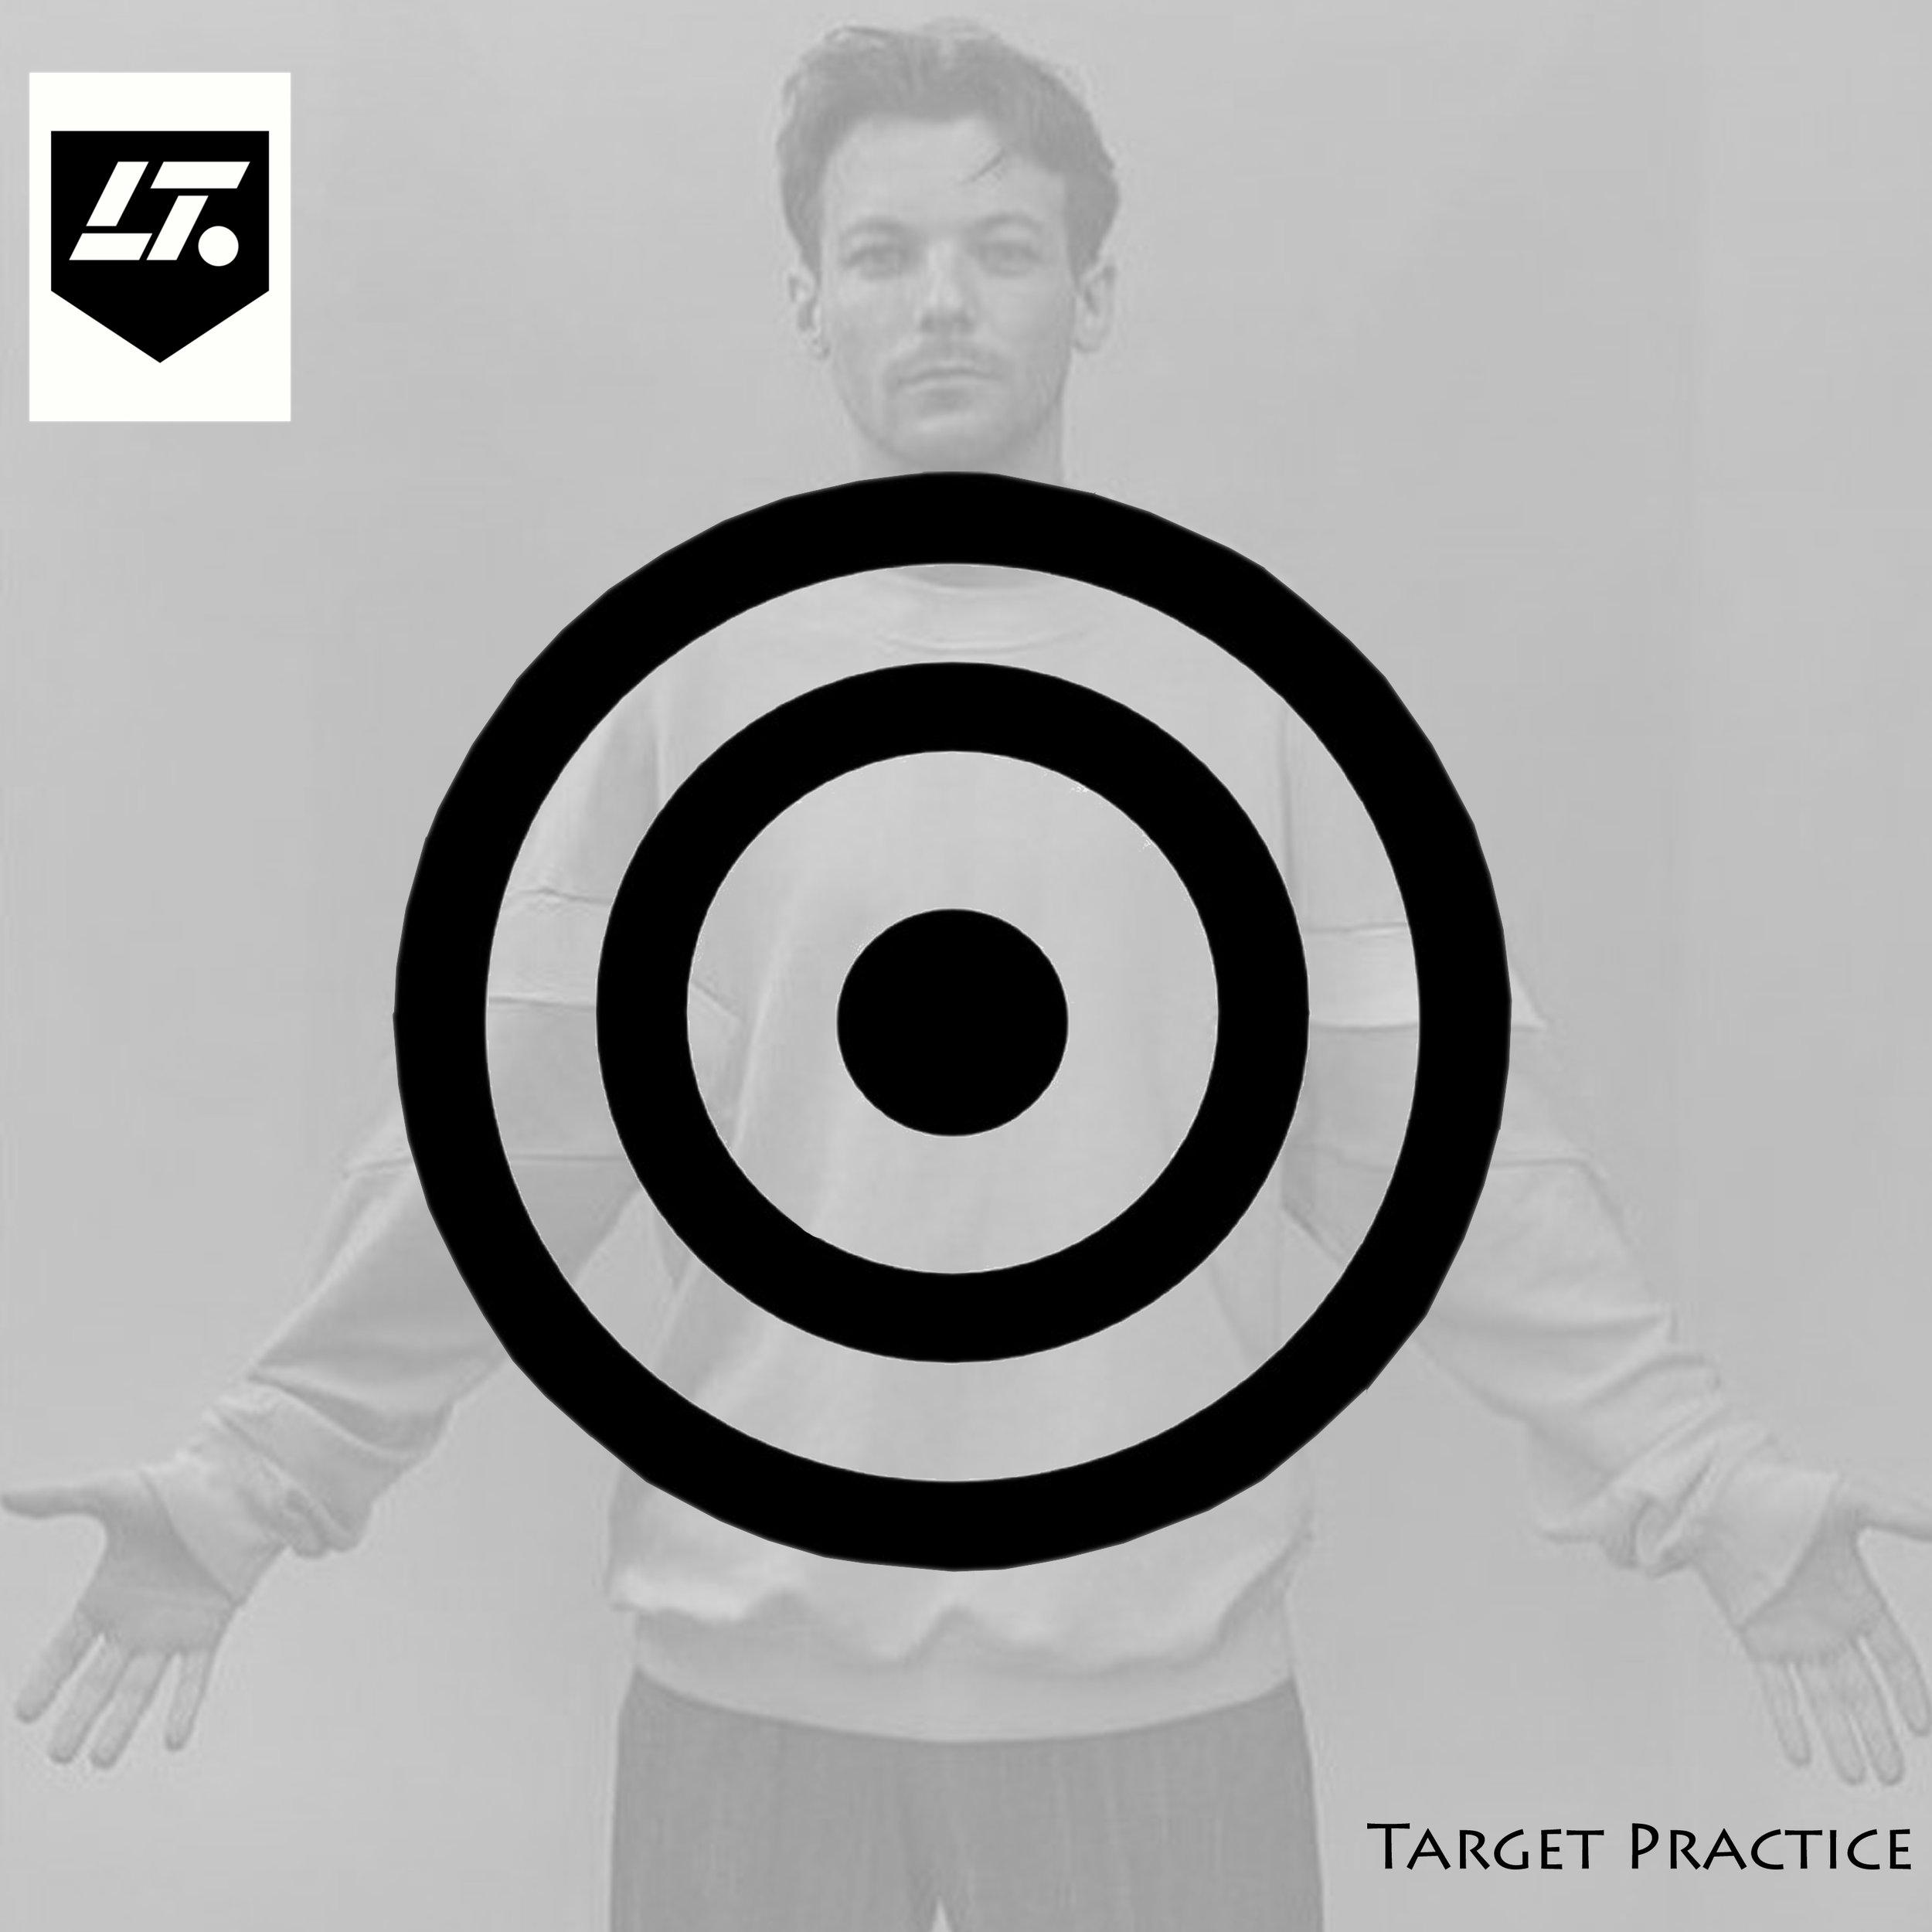 57. Target Practice   John